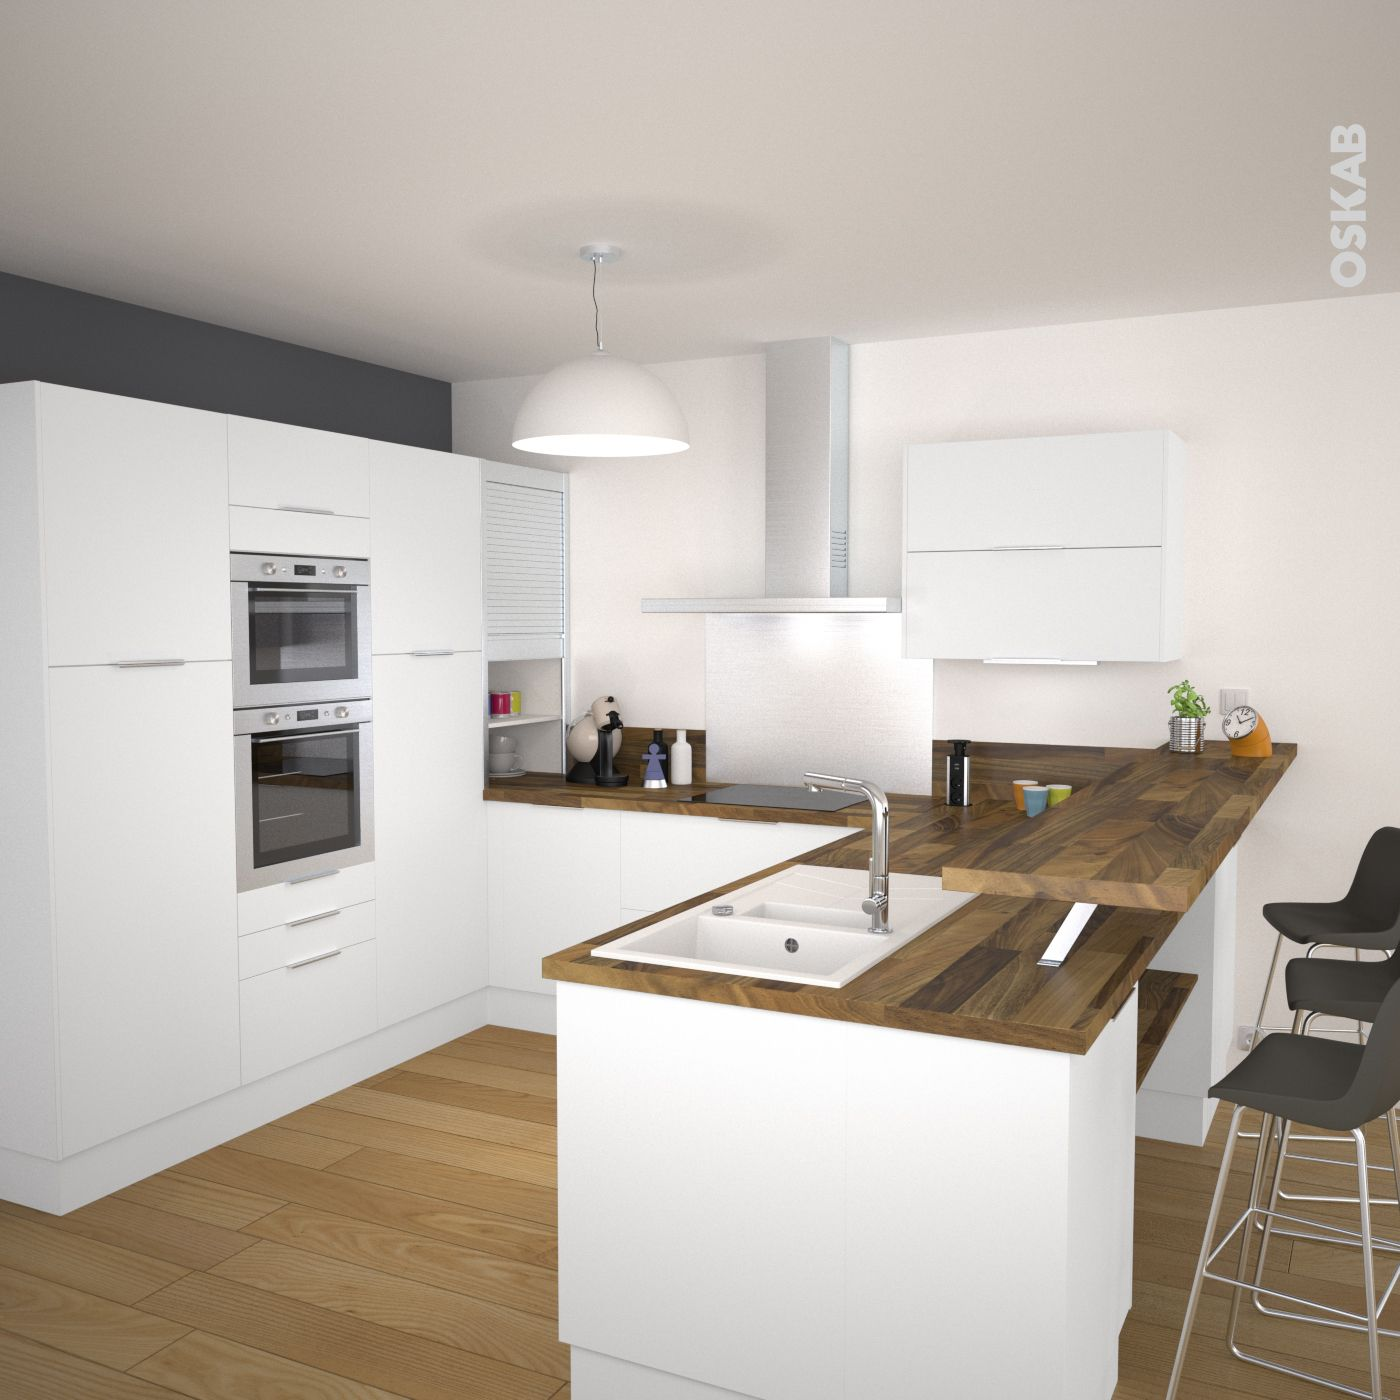 crdence cuisine schmidt gallery of poignee porte cuisine schmidt id e relooking armoires de en. Black Bedroom Furniture Sets. Home Design Ideas